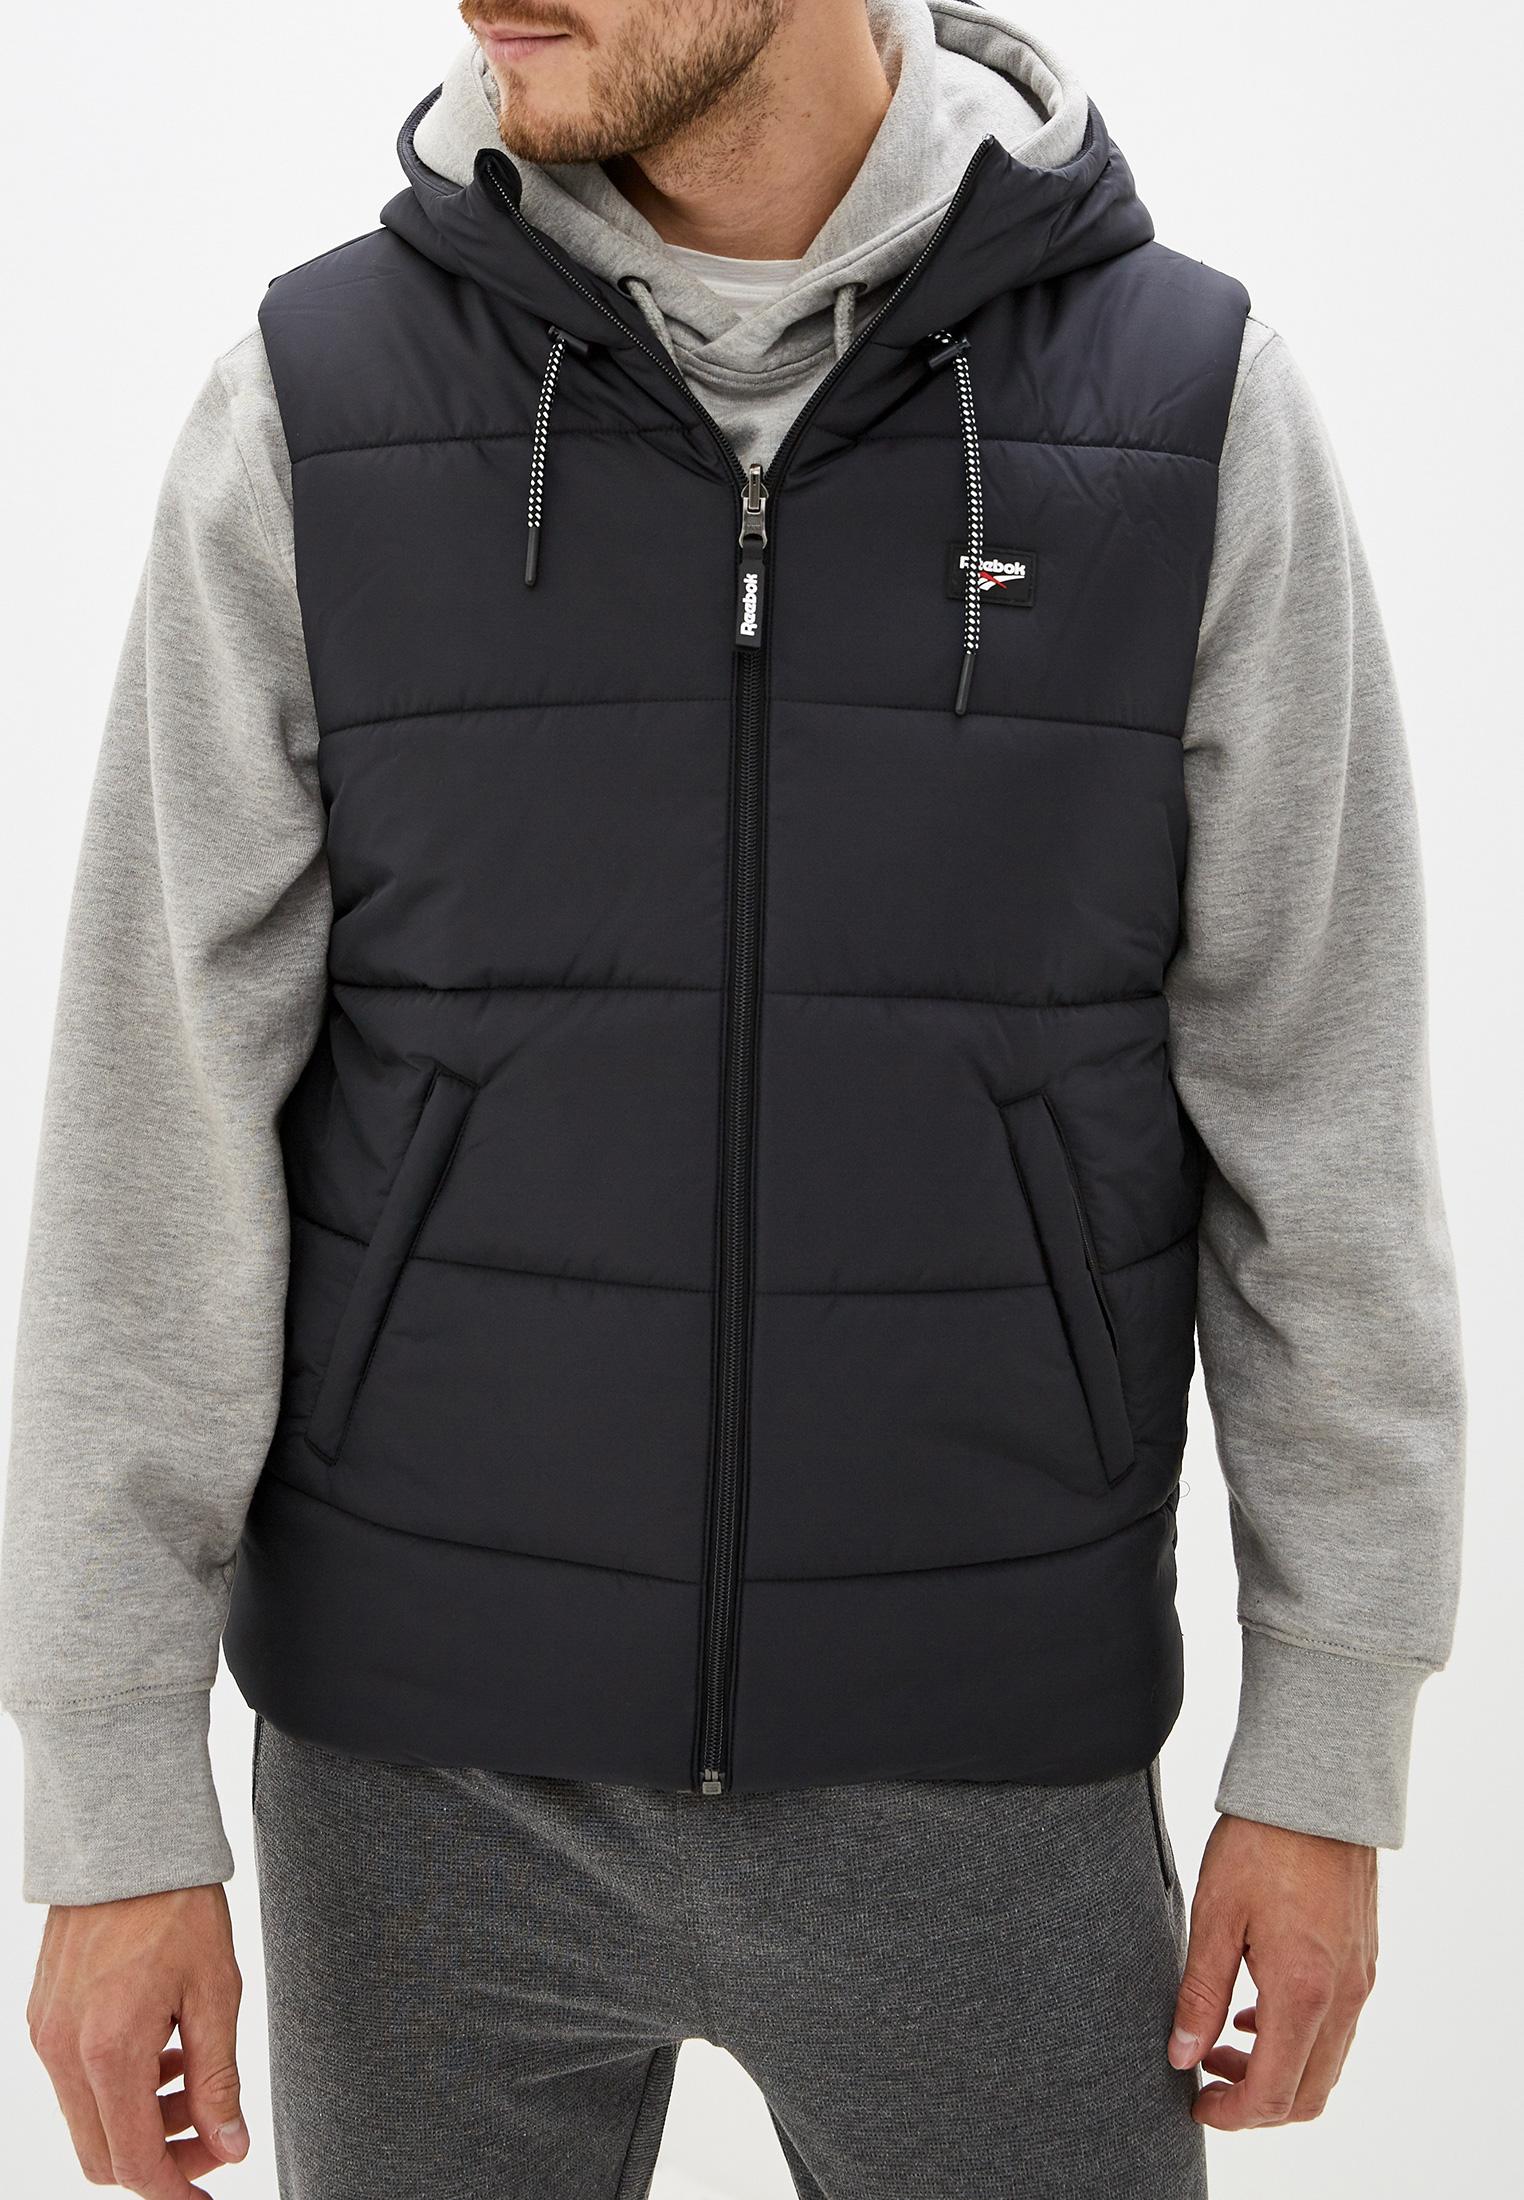 Мужская верхняя одежда Reebok Classics DY6013